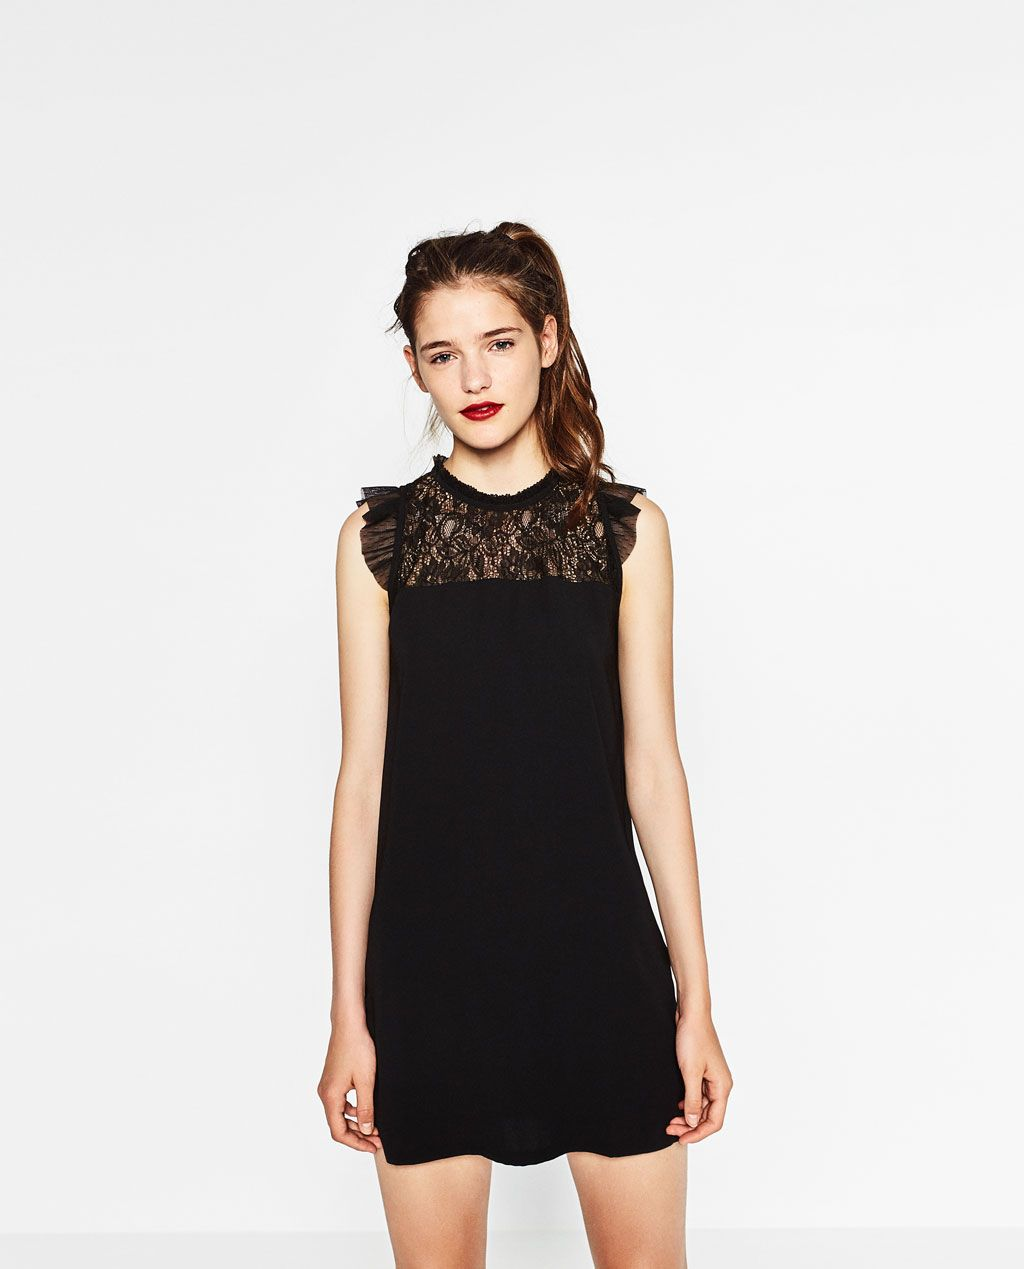 76834e2d13dd DRESS WITH A LACE BIB FRONT-DRESSES-WOMAN